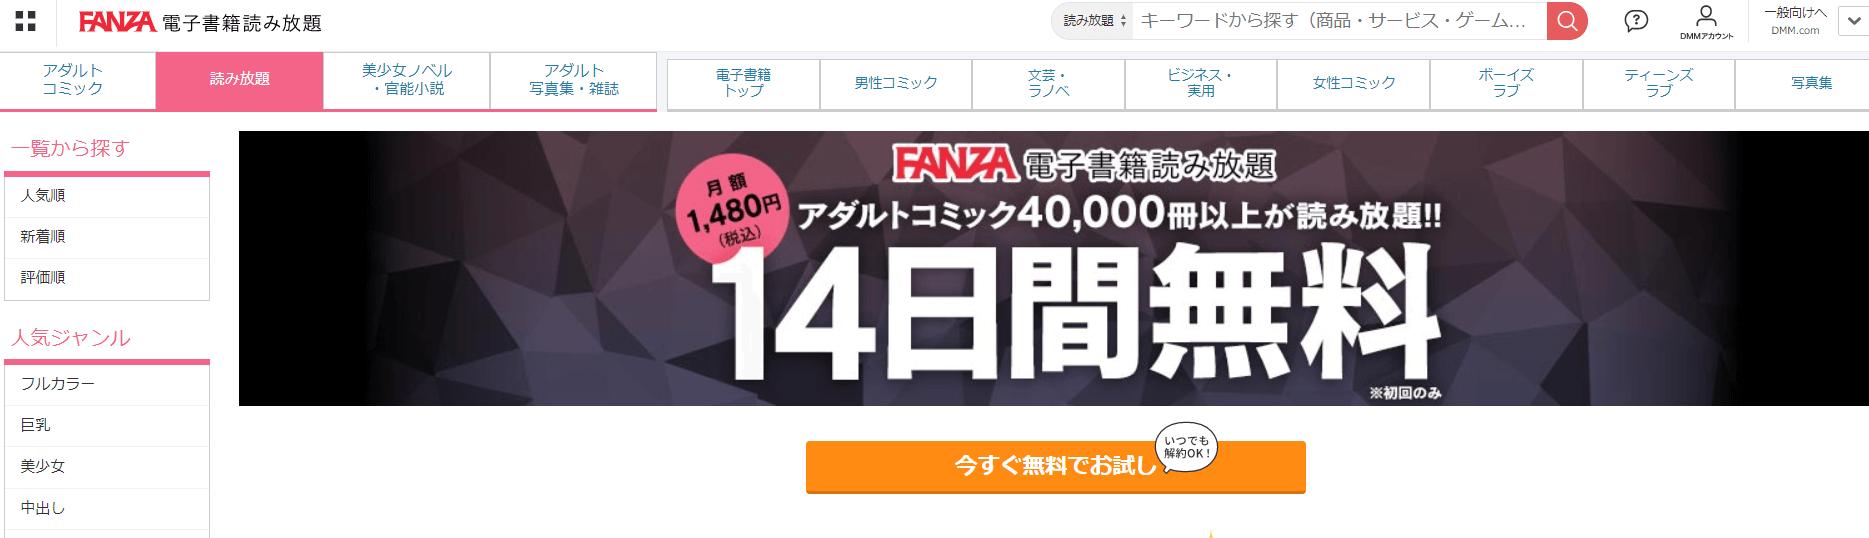 FANZA電子書籍読み放題公式サイト